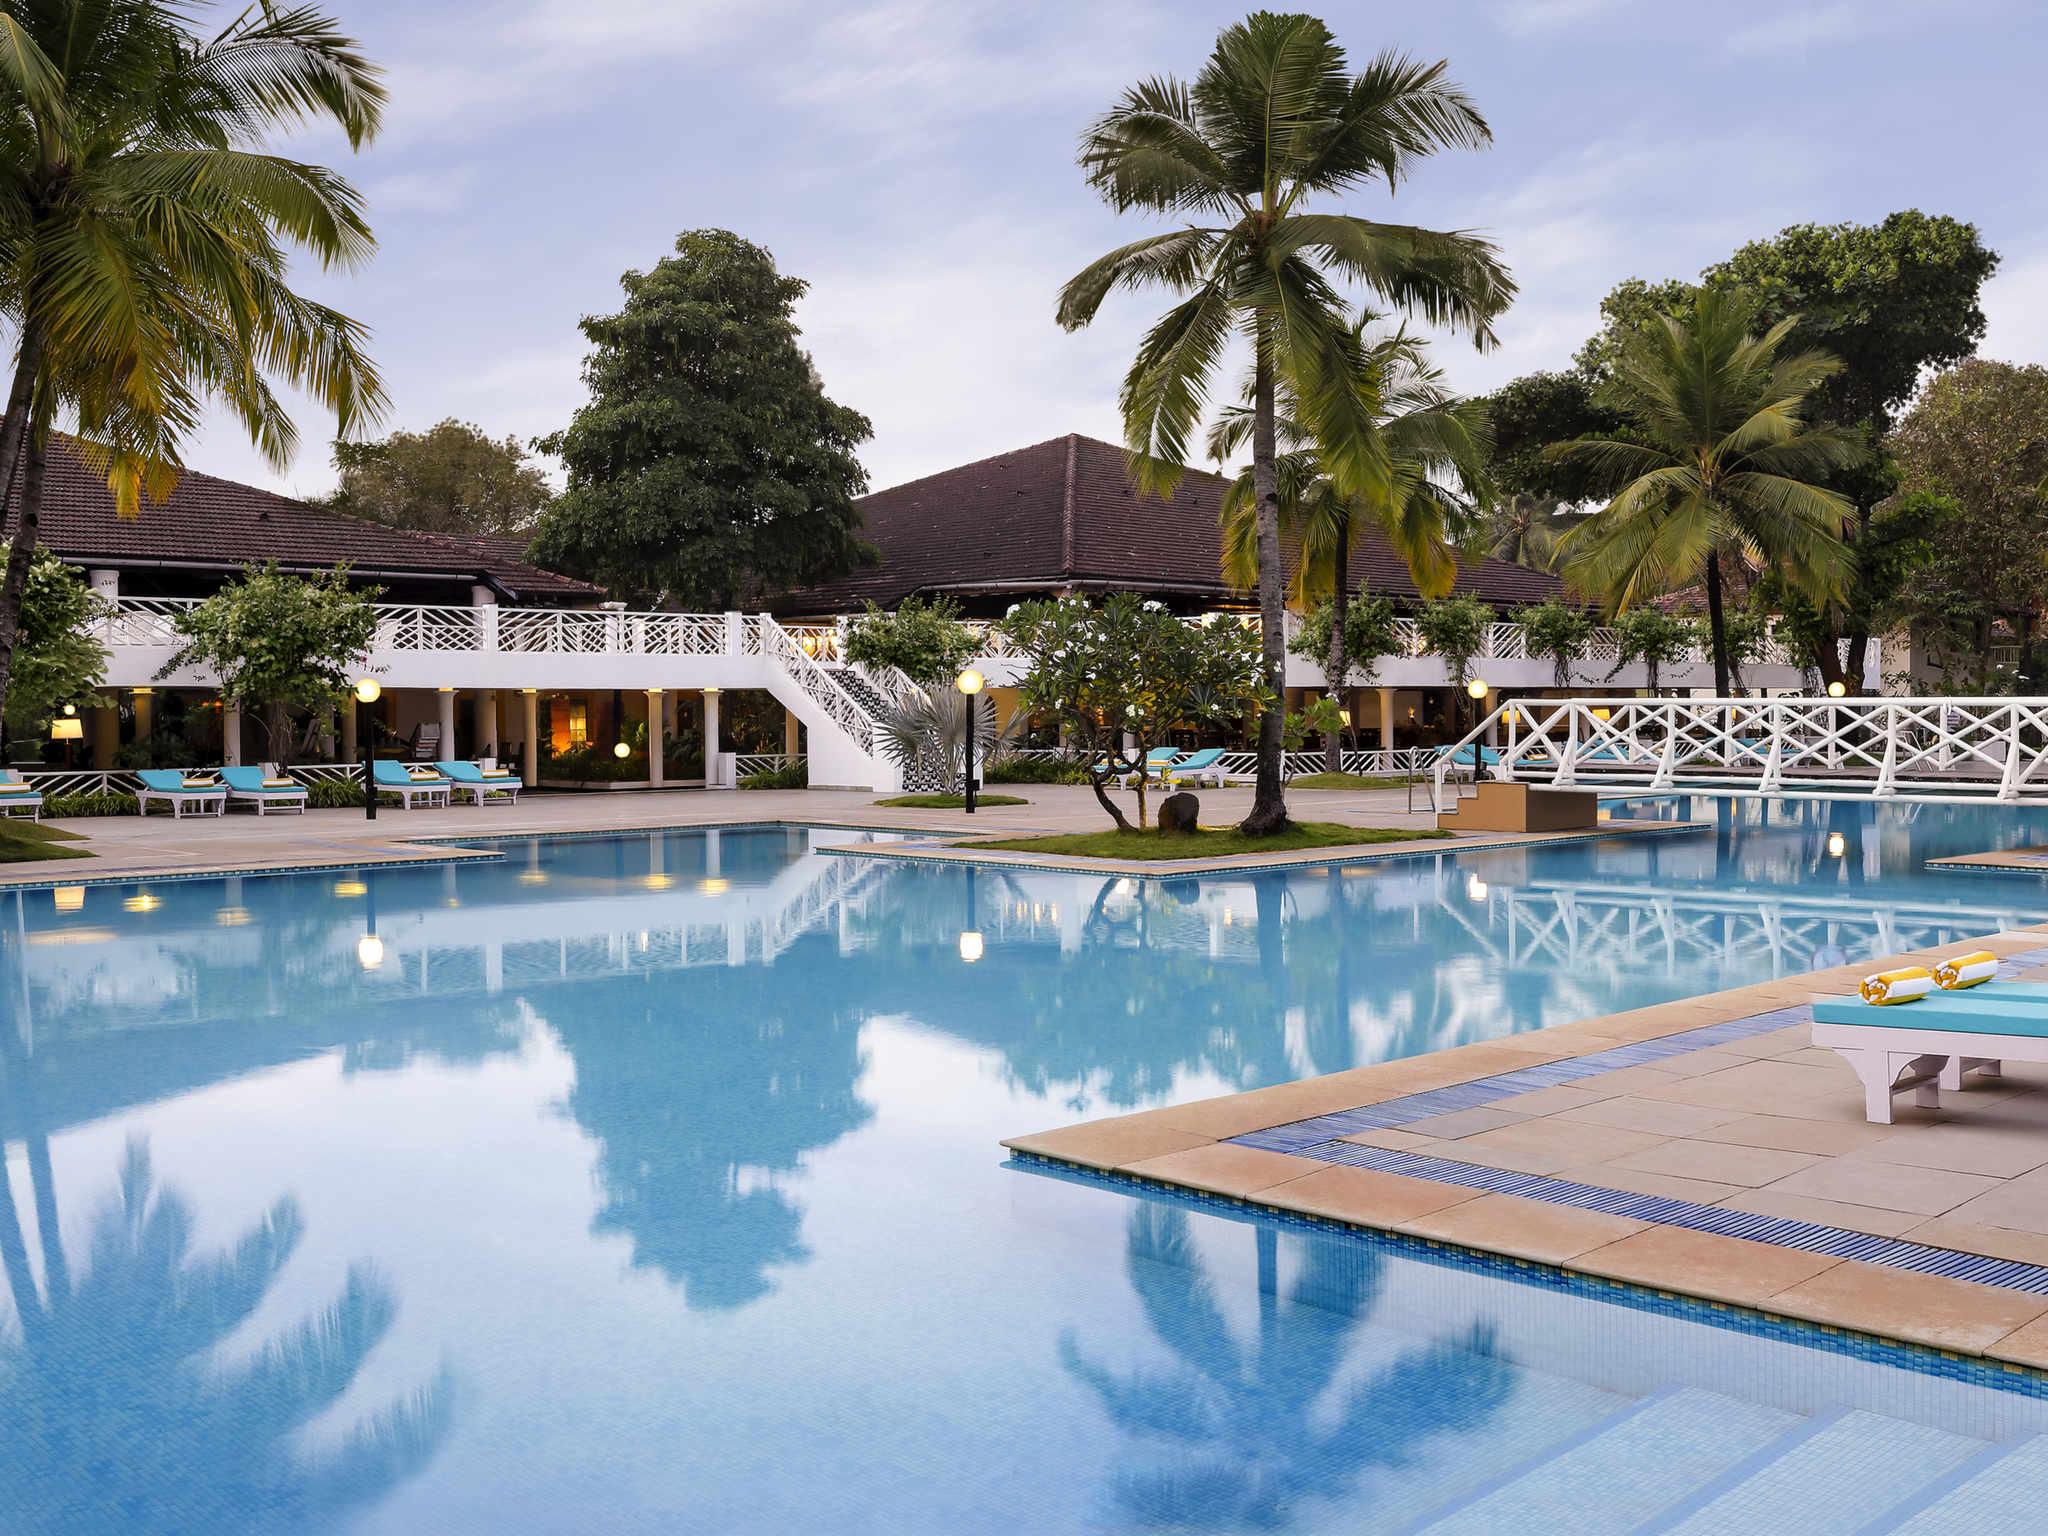 Hotel in GOA Novotel Goa Dona Sylvia Resort